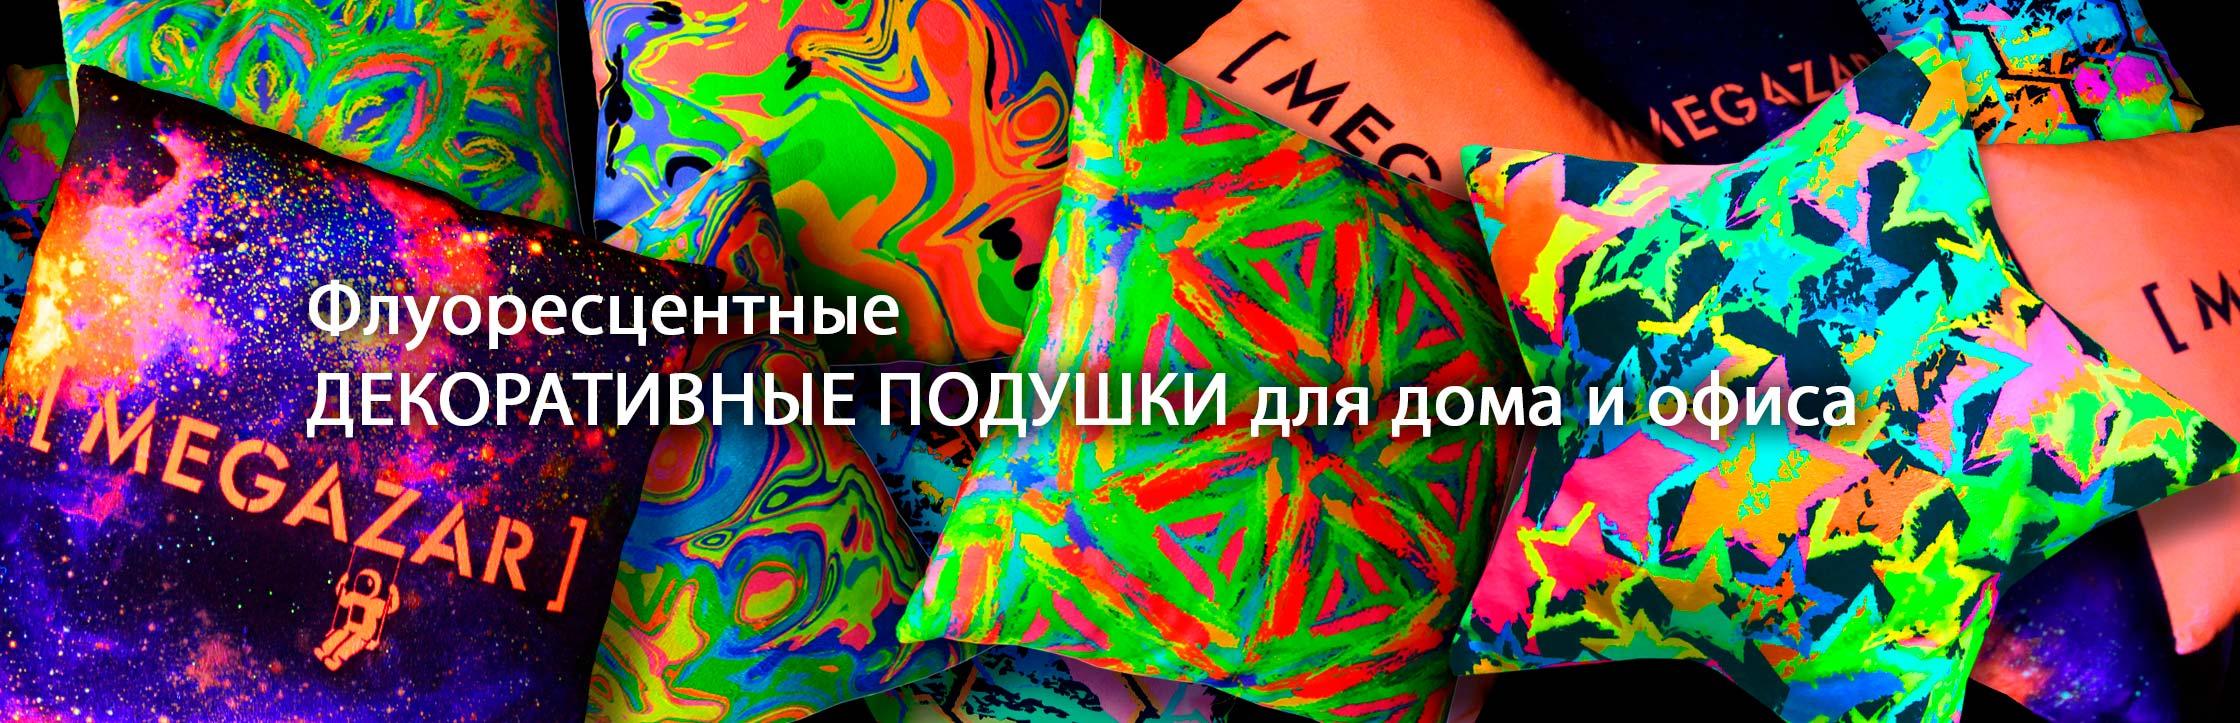 fluorestsentnyie-dekorativnyie-podushki